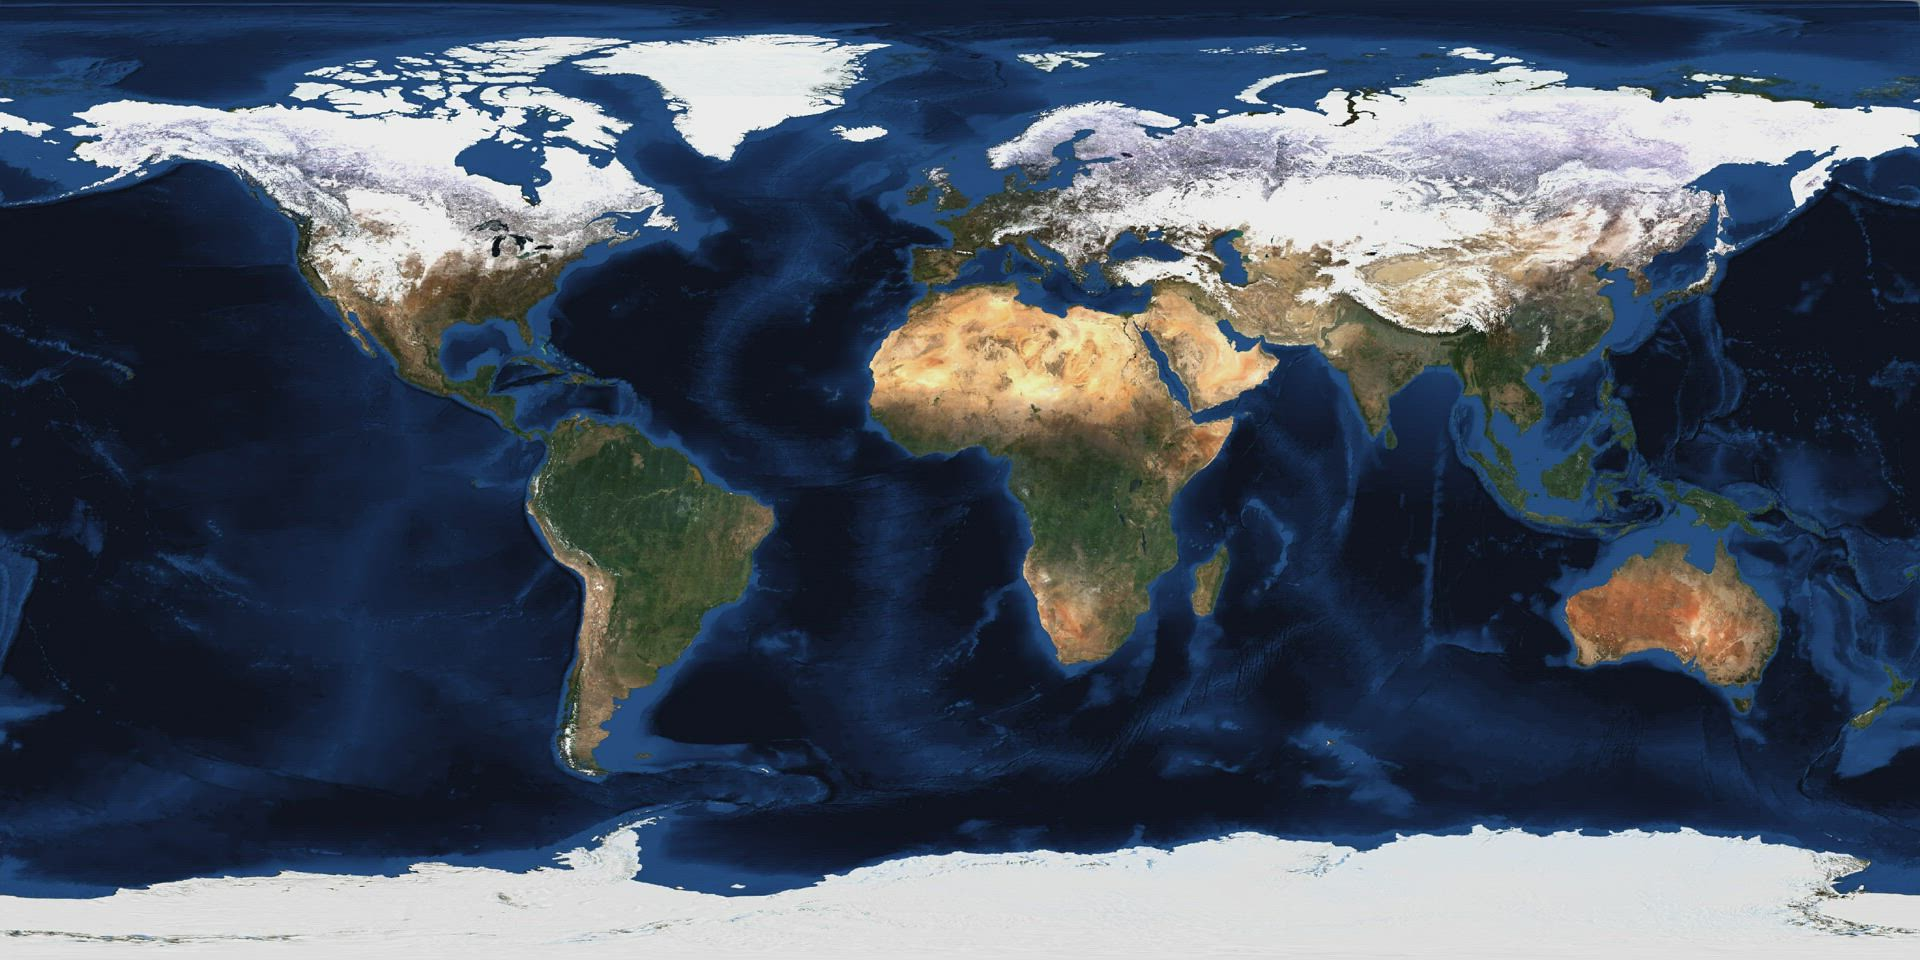 World Mosaic Time-lapse 2019 Blue Marble Background